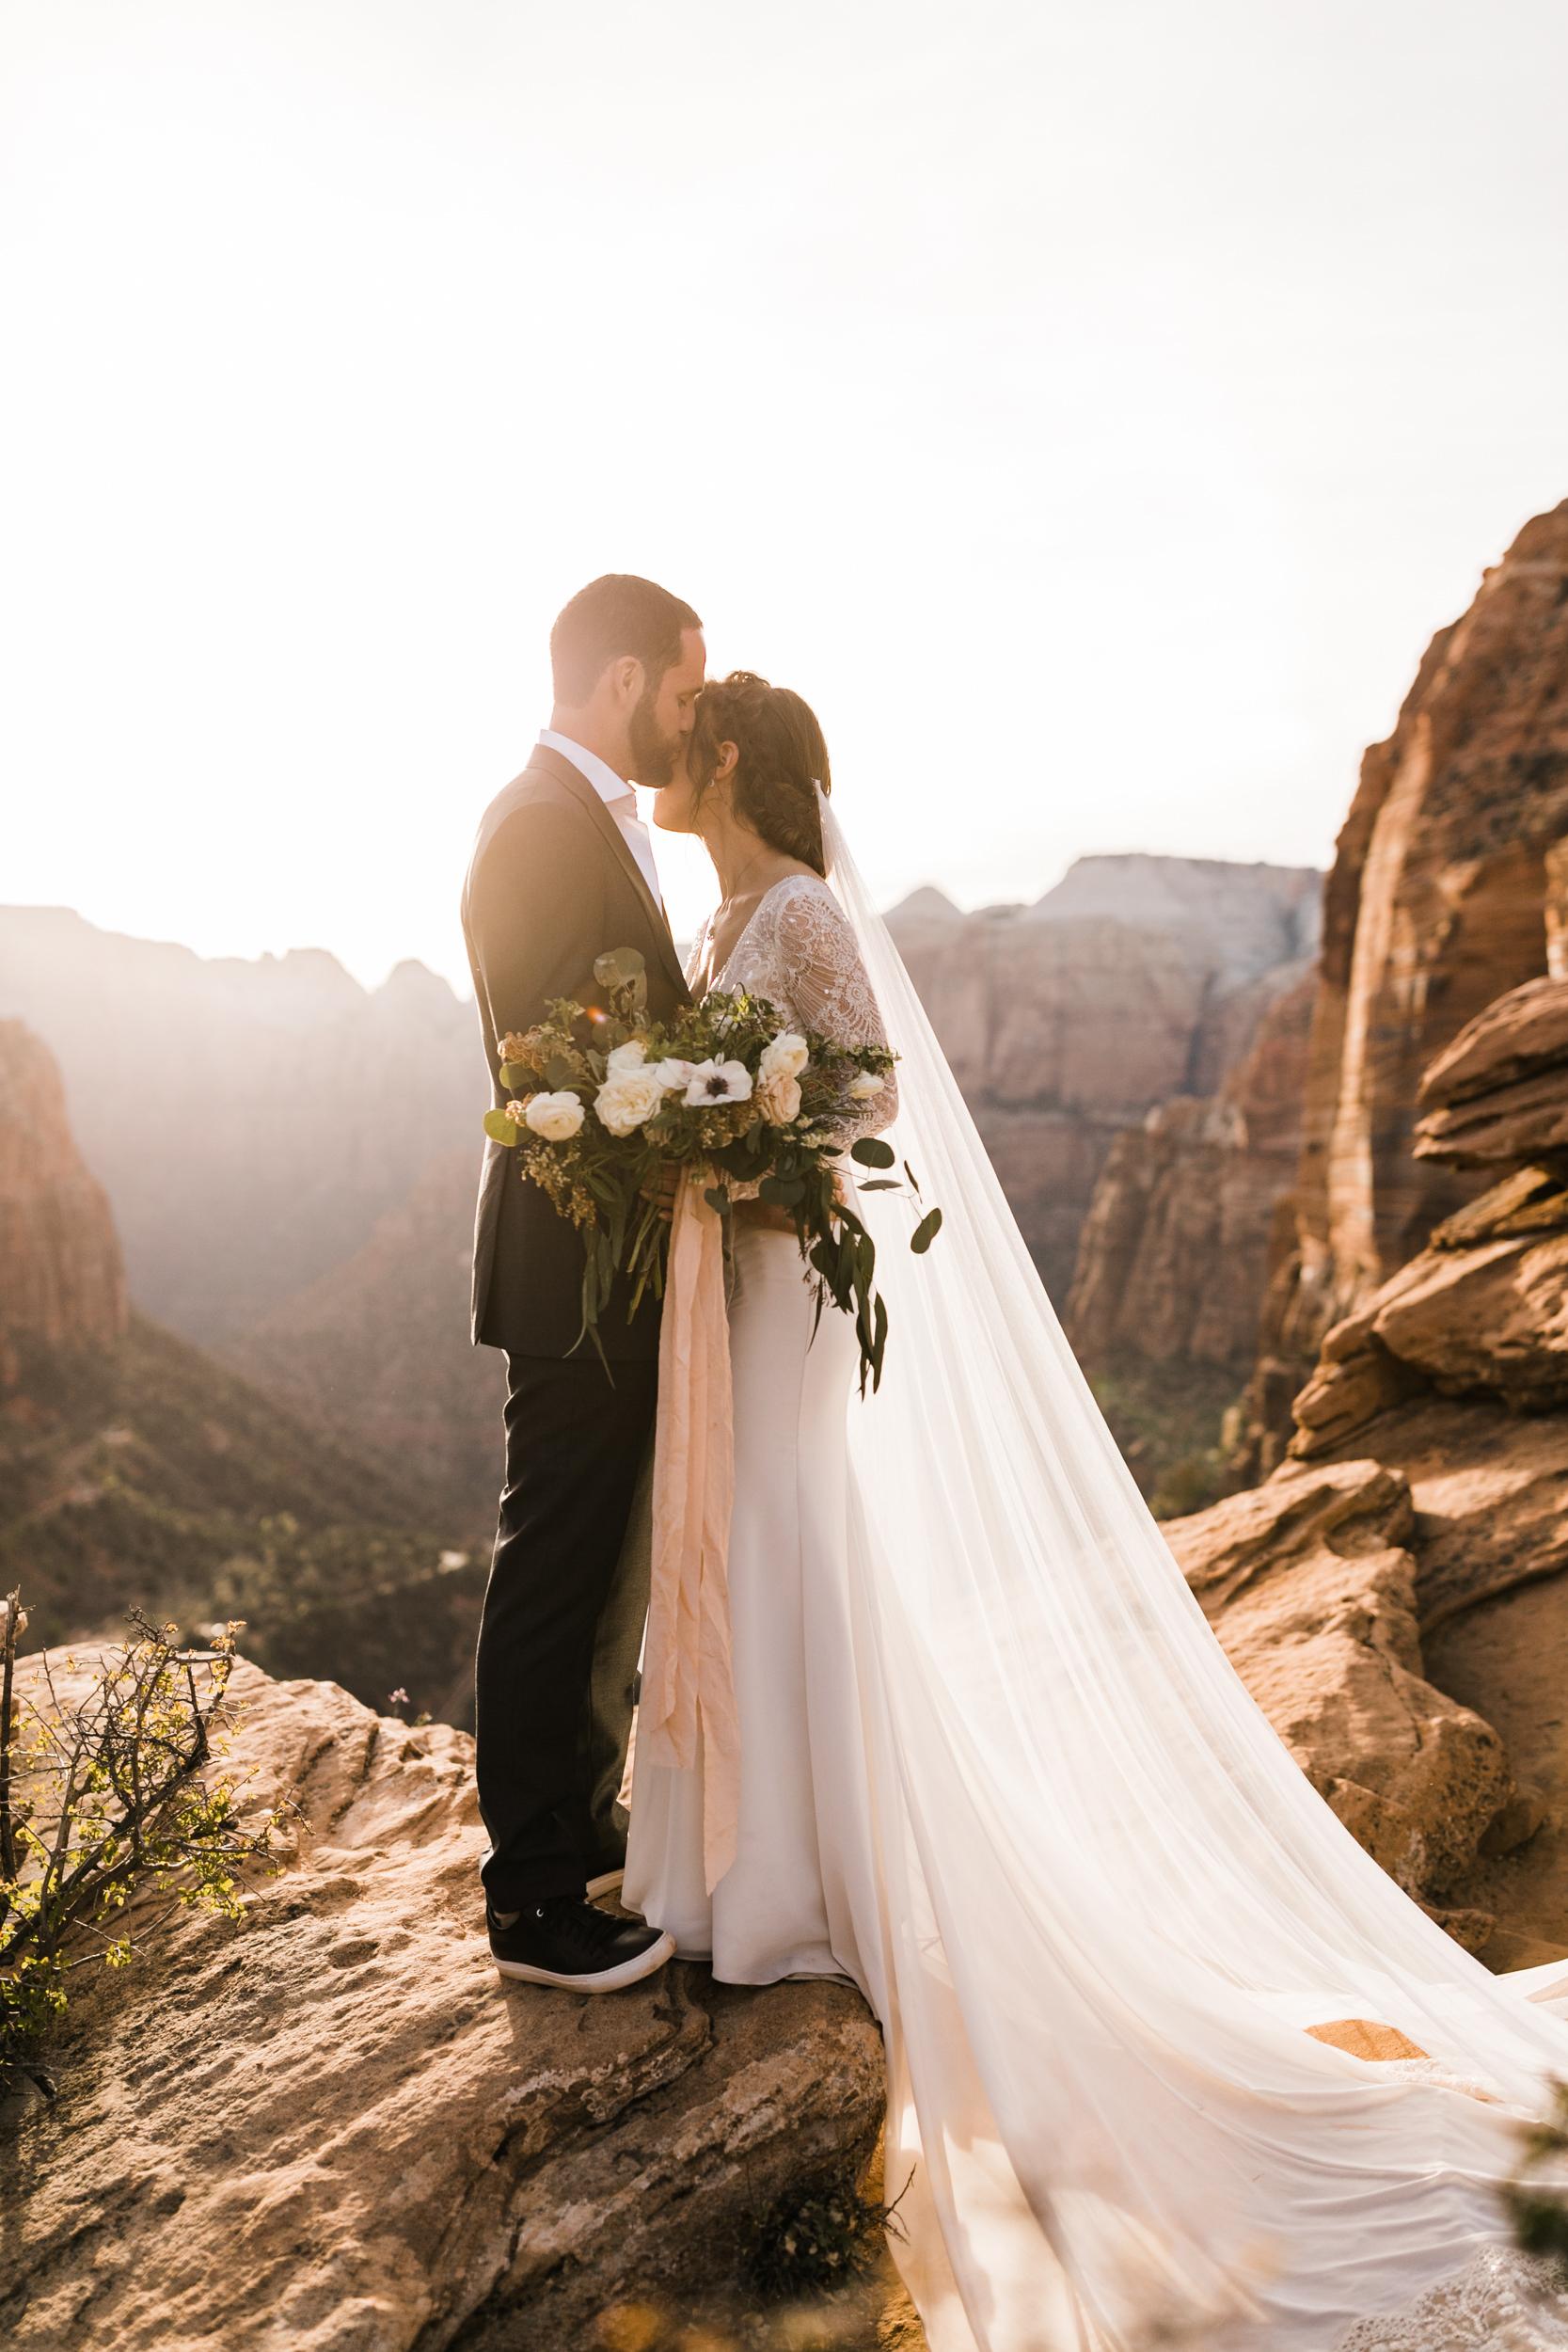 Zion-National-Park-Adventure-Wedding-Hearnes-Elopement-Photography-37.jpg